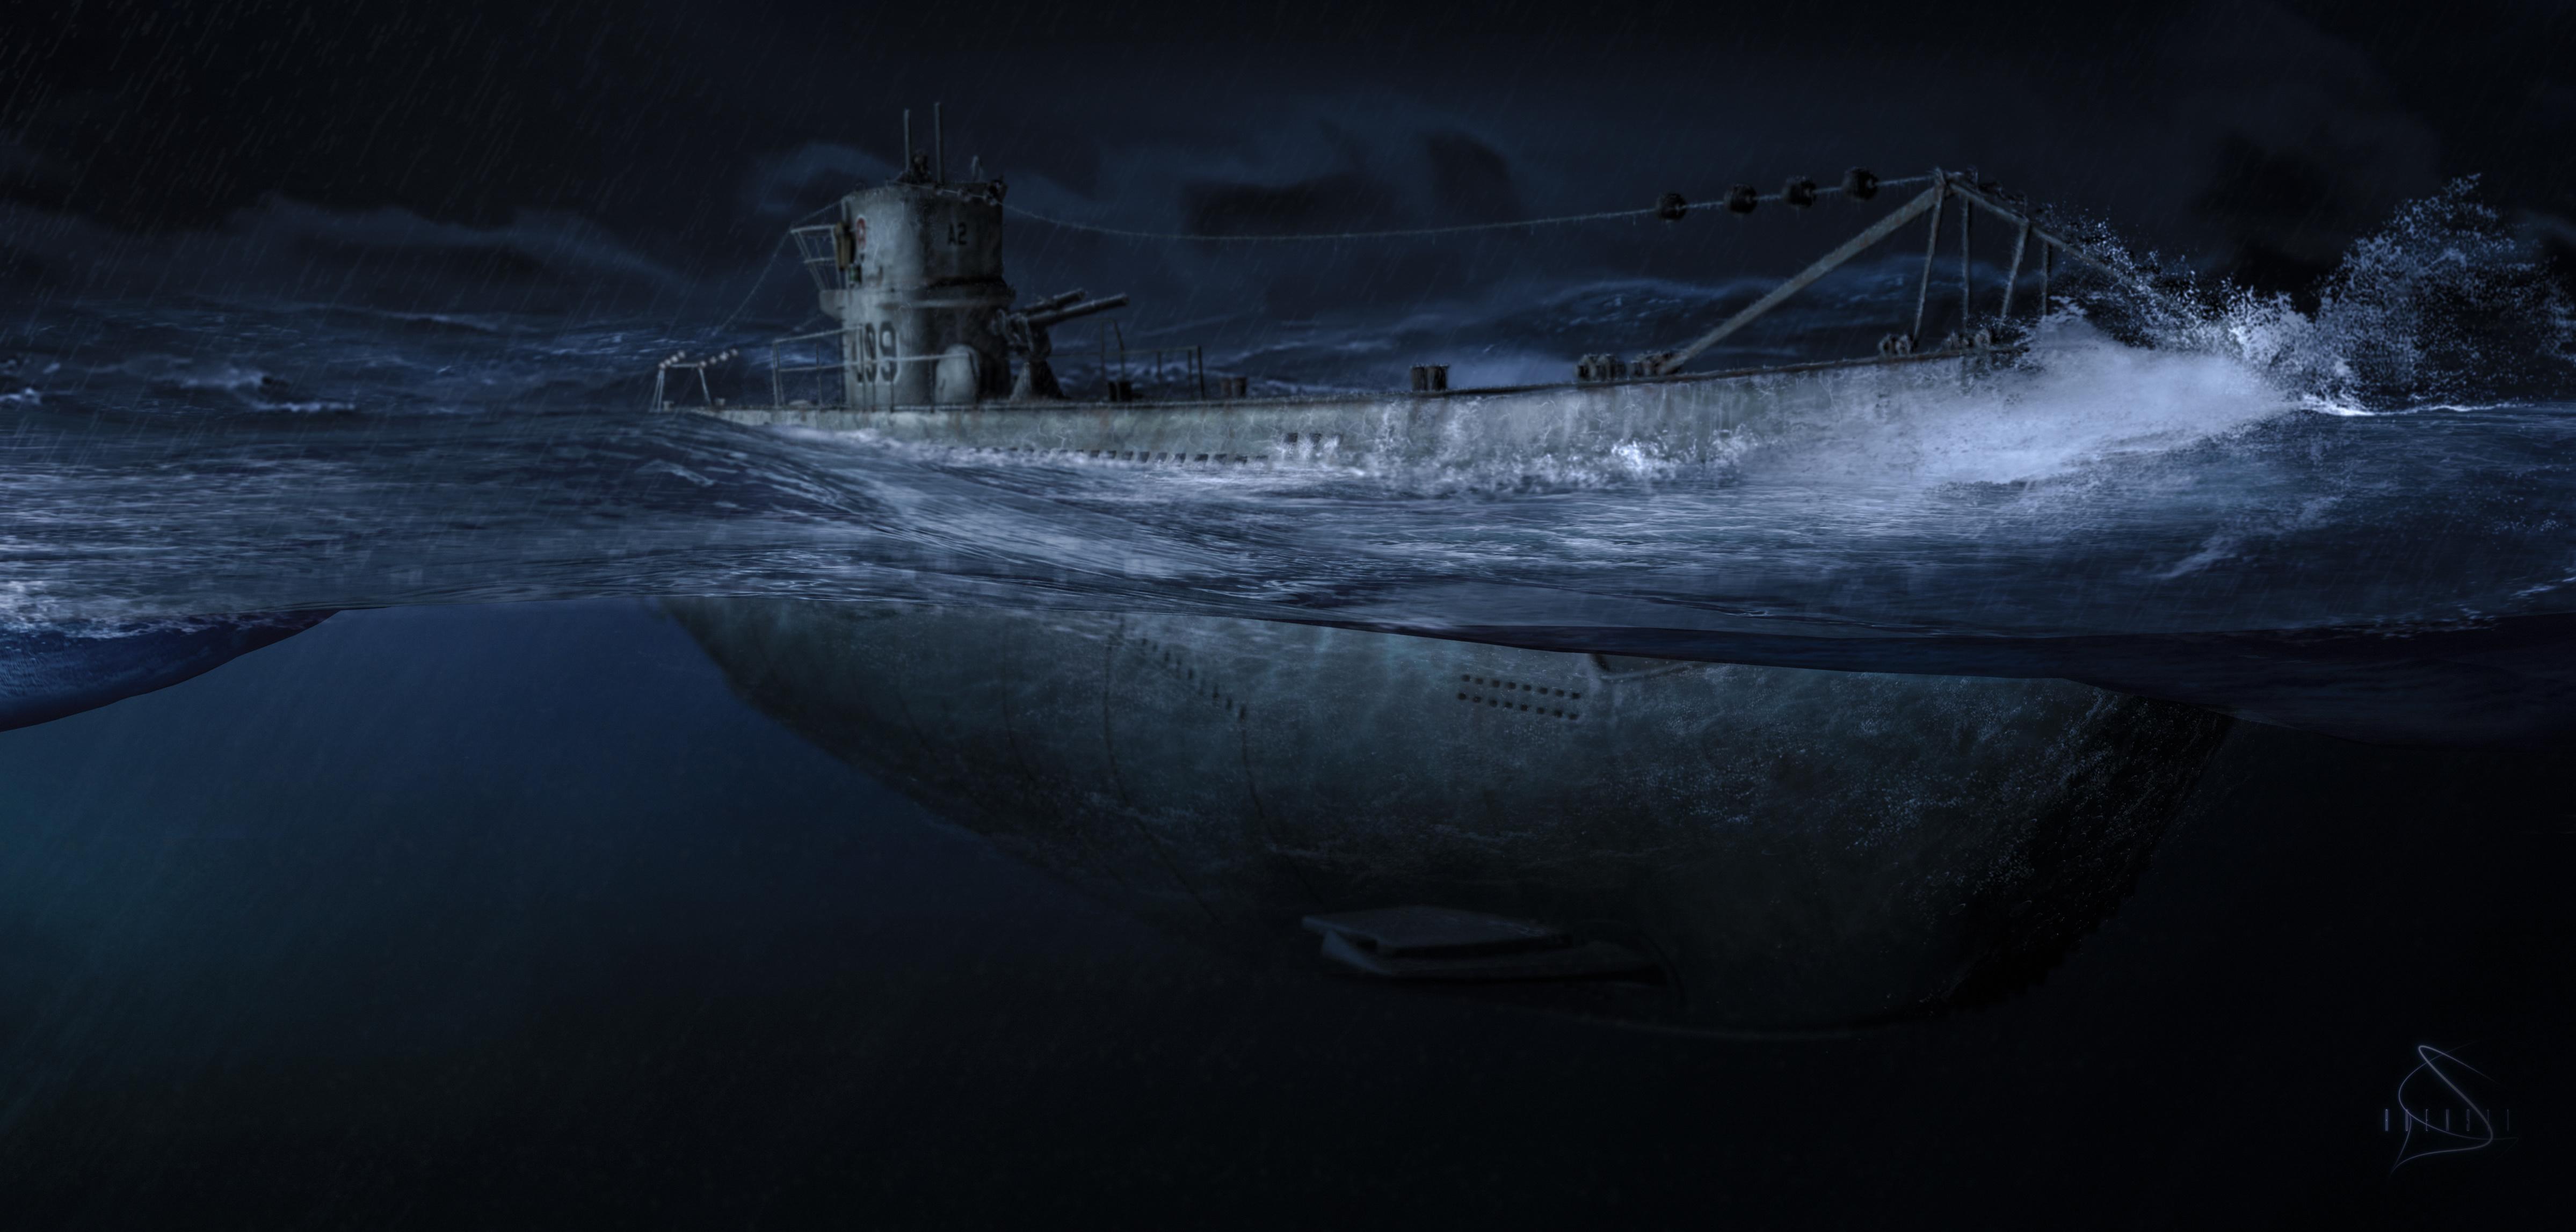 Ocean night submarine art military wallpaper 4797x2295 228388 4797x2295